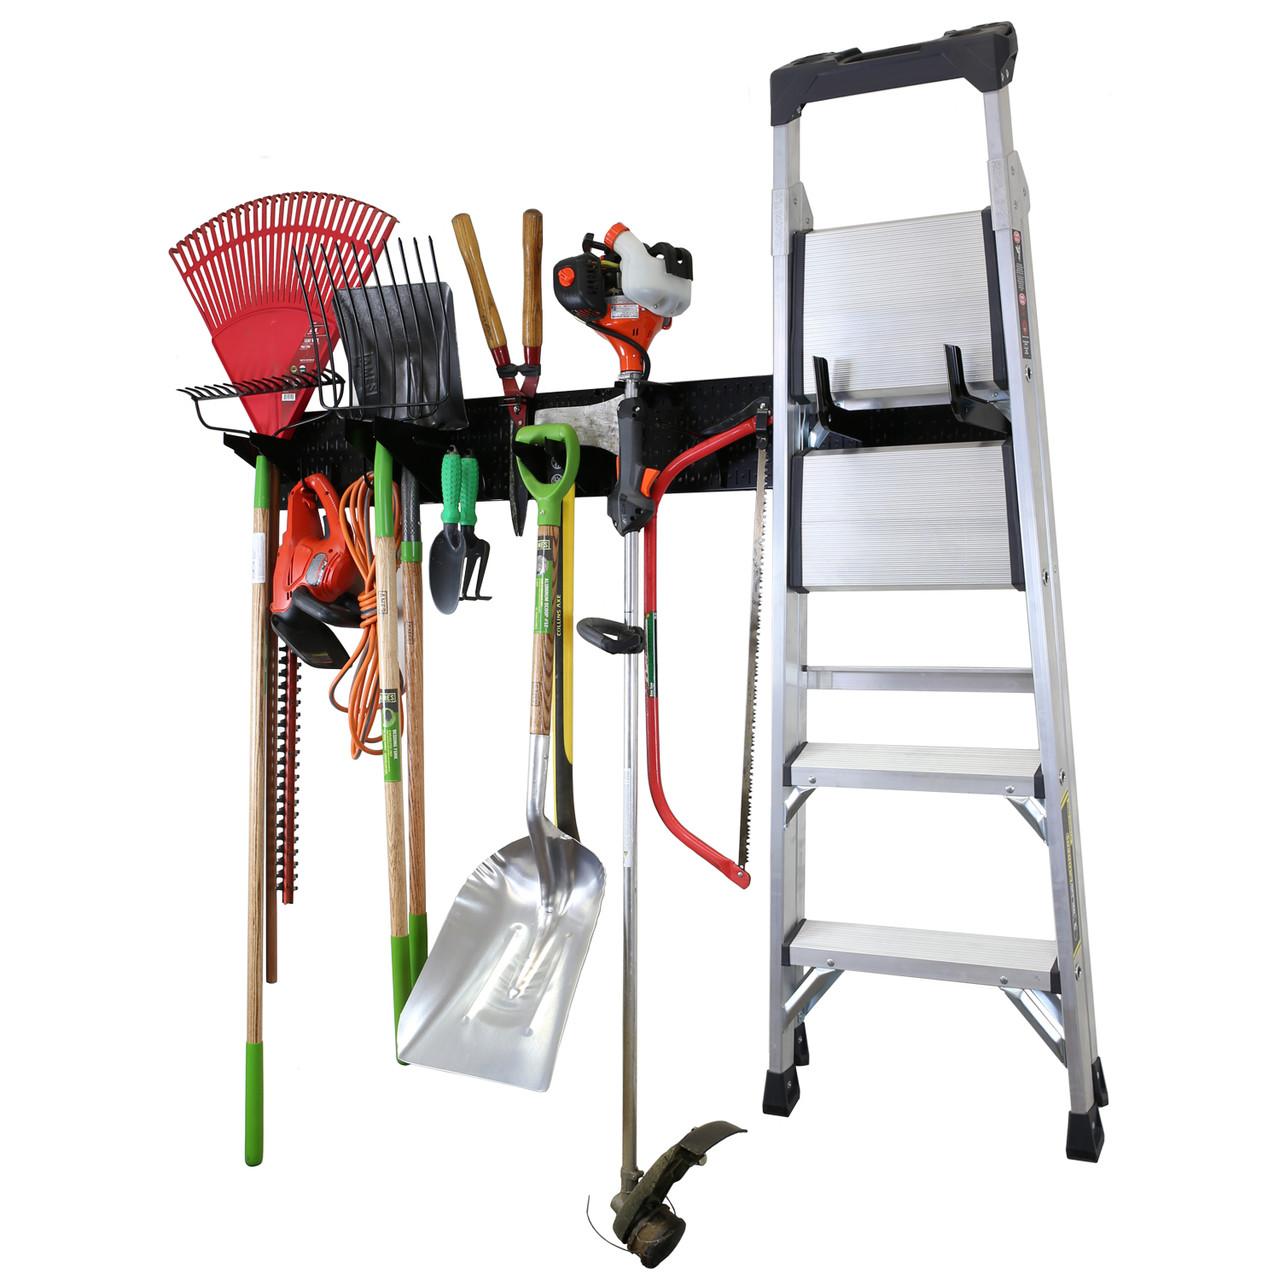 Garage Storage Lawn Garden Tool Organization Wall Organizer Rack Black Pegboard With Accessories